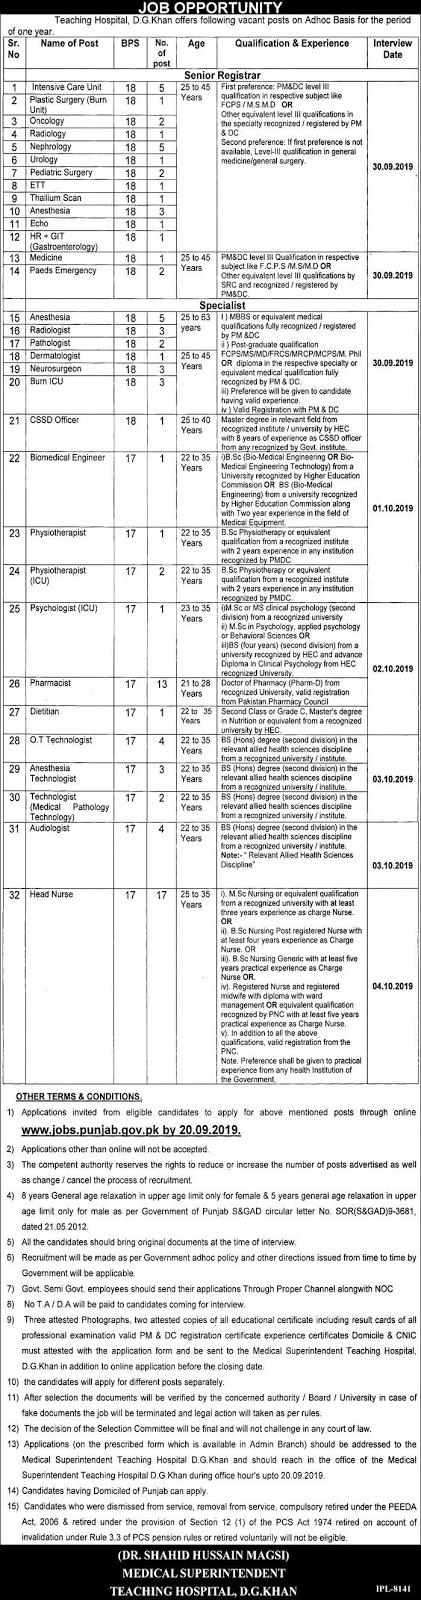 Advertisement for DG Khan Teaching Hospital Jobs